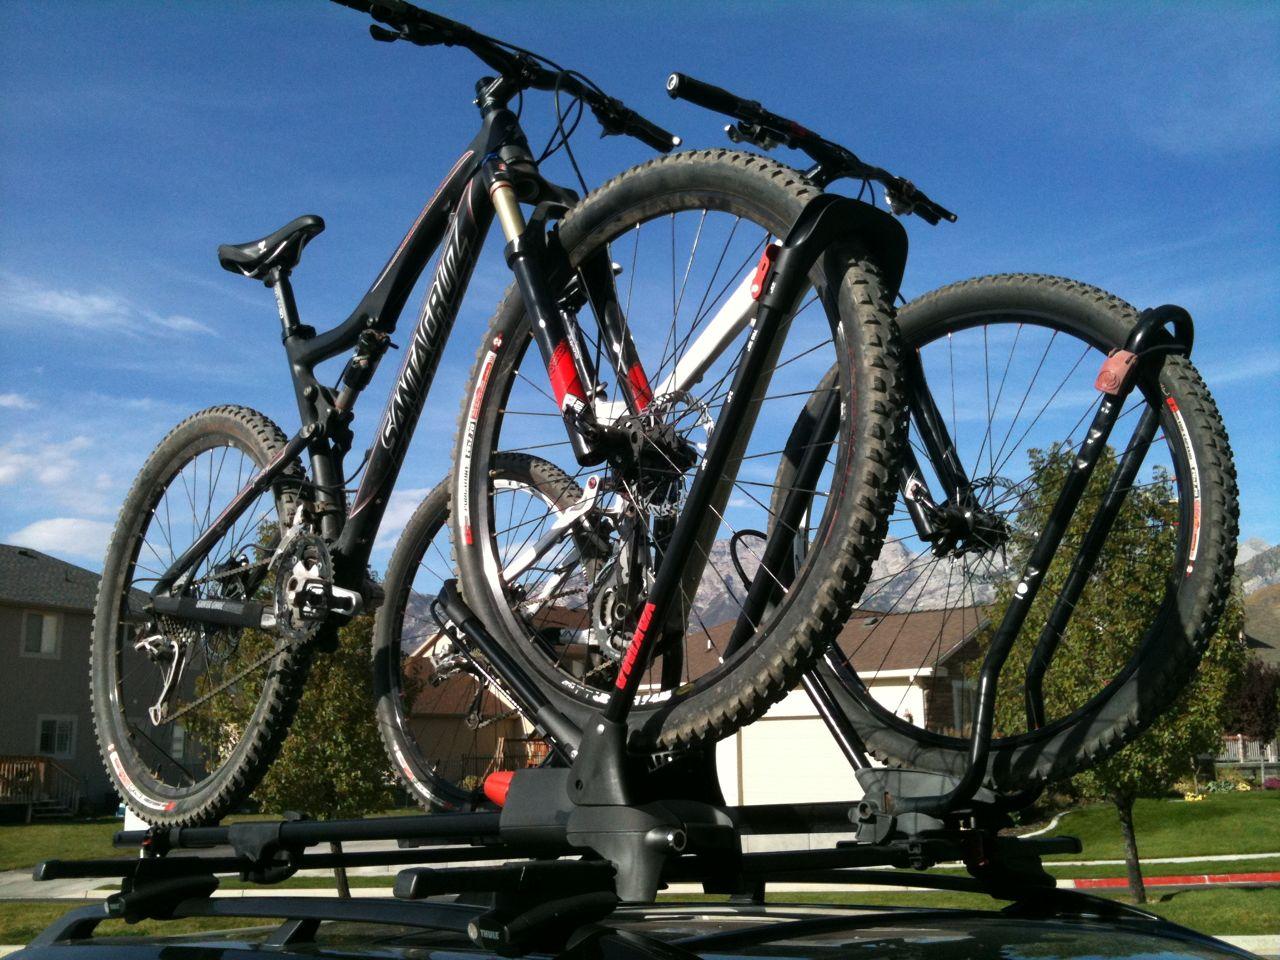 yakima bike rack instructions